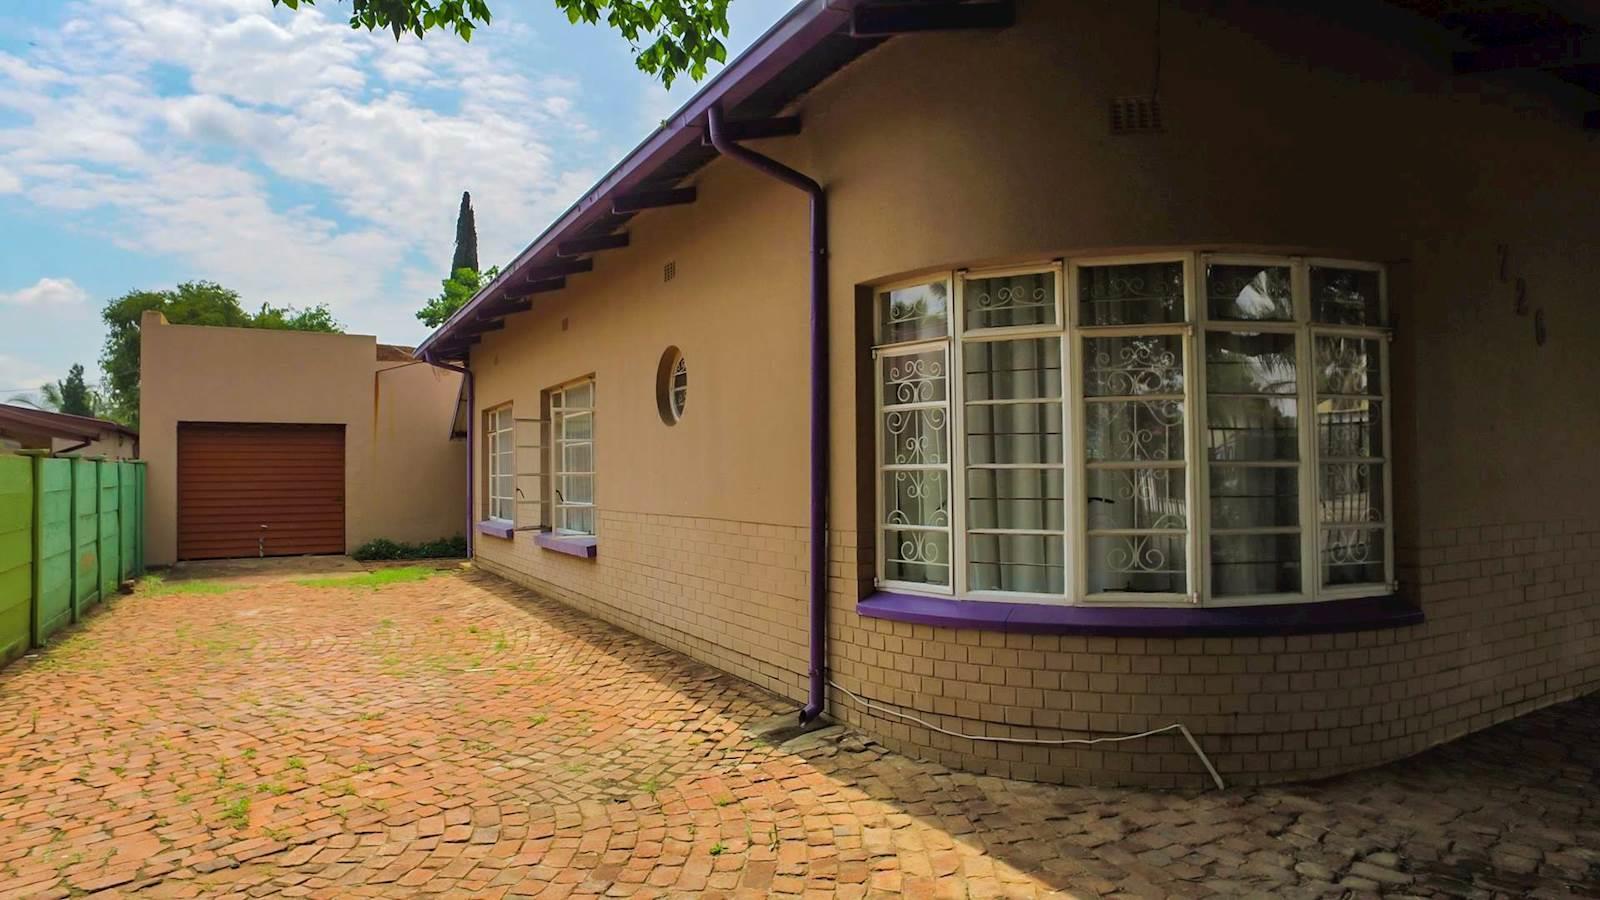 Pretoria, Mayville Property  | Houses For Sale Mayville, Mayville, BedAndBreakfast 8 bedrooms property for sale Price:4,400,000